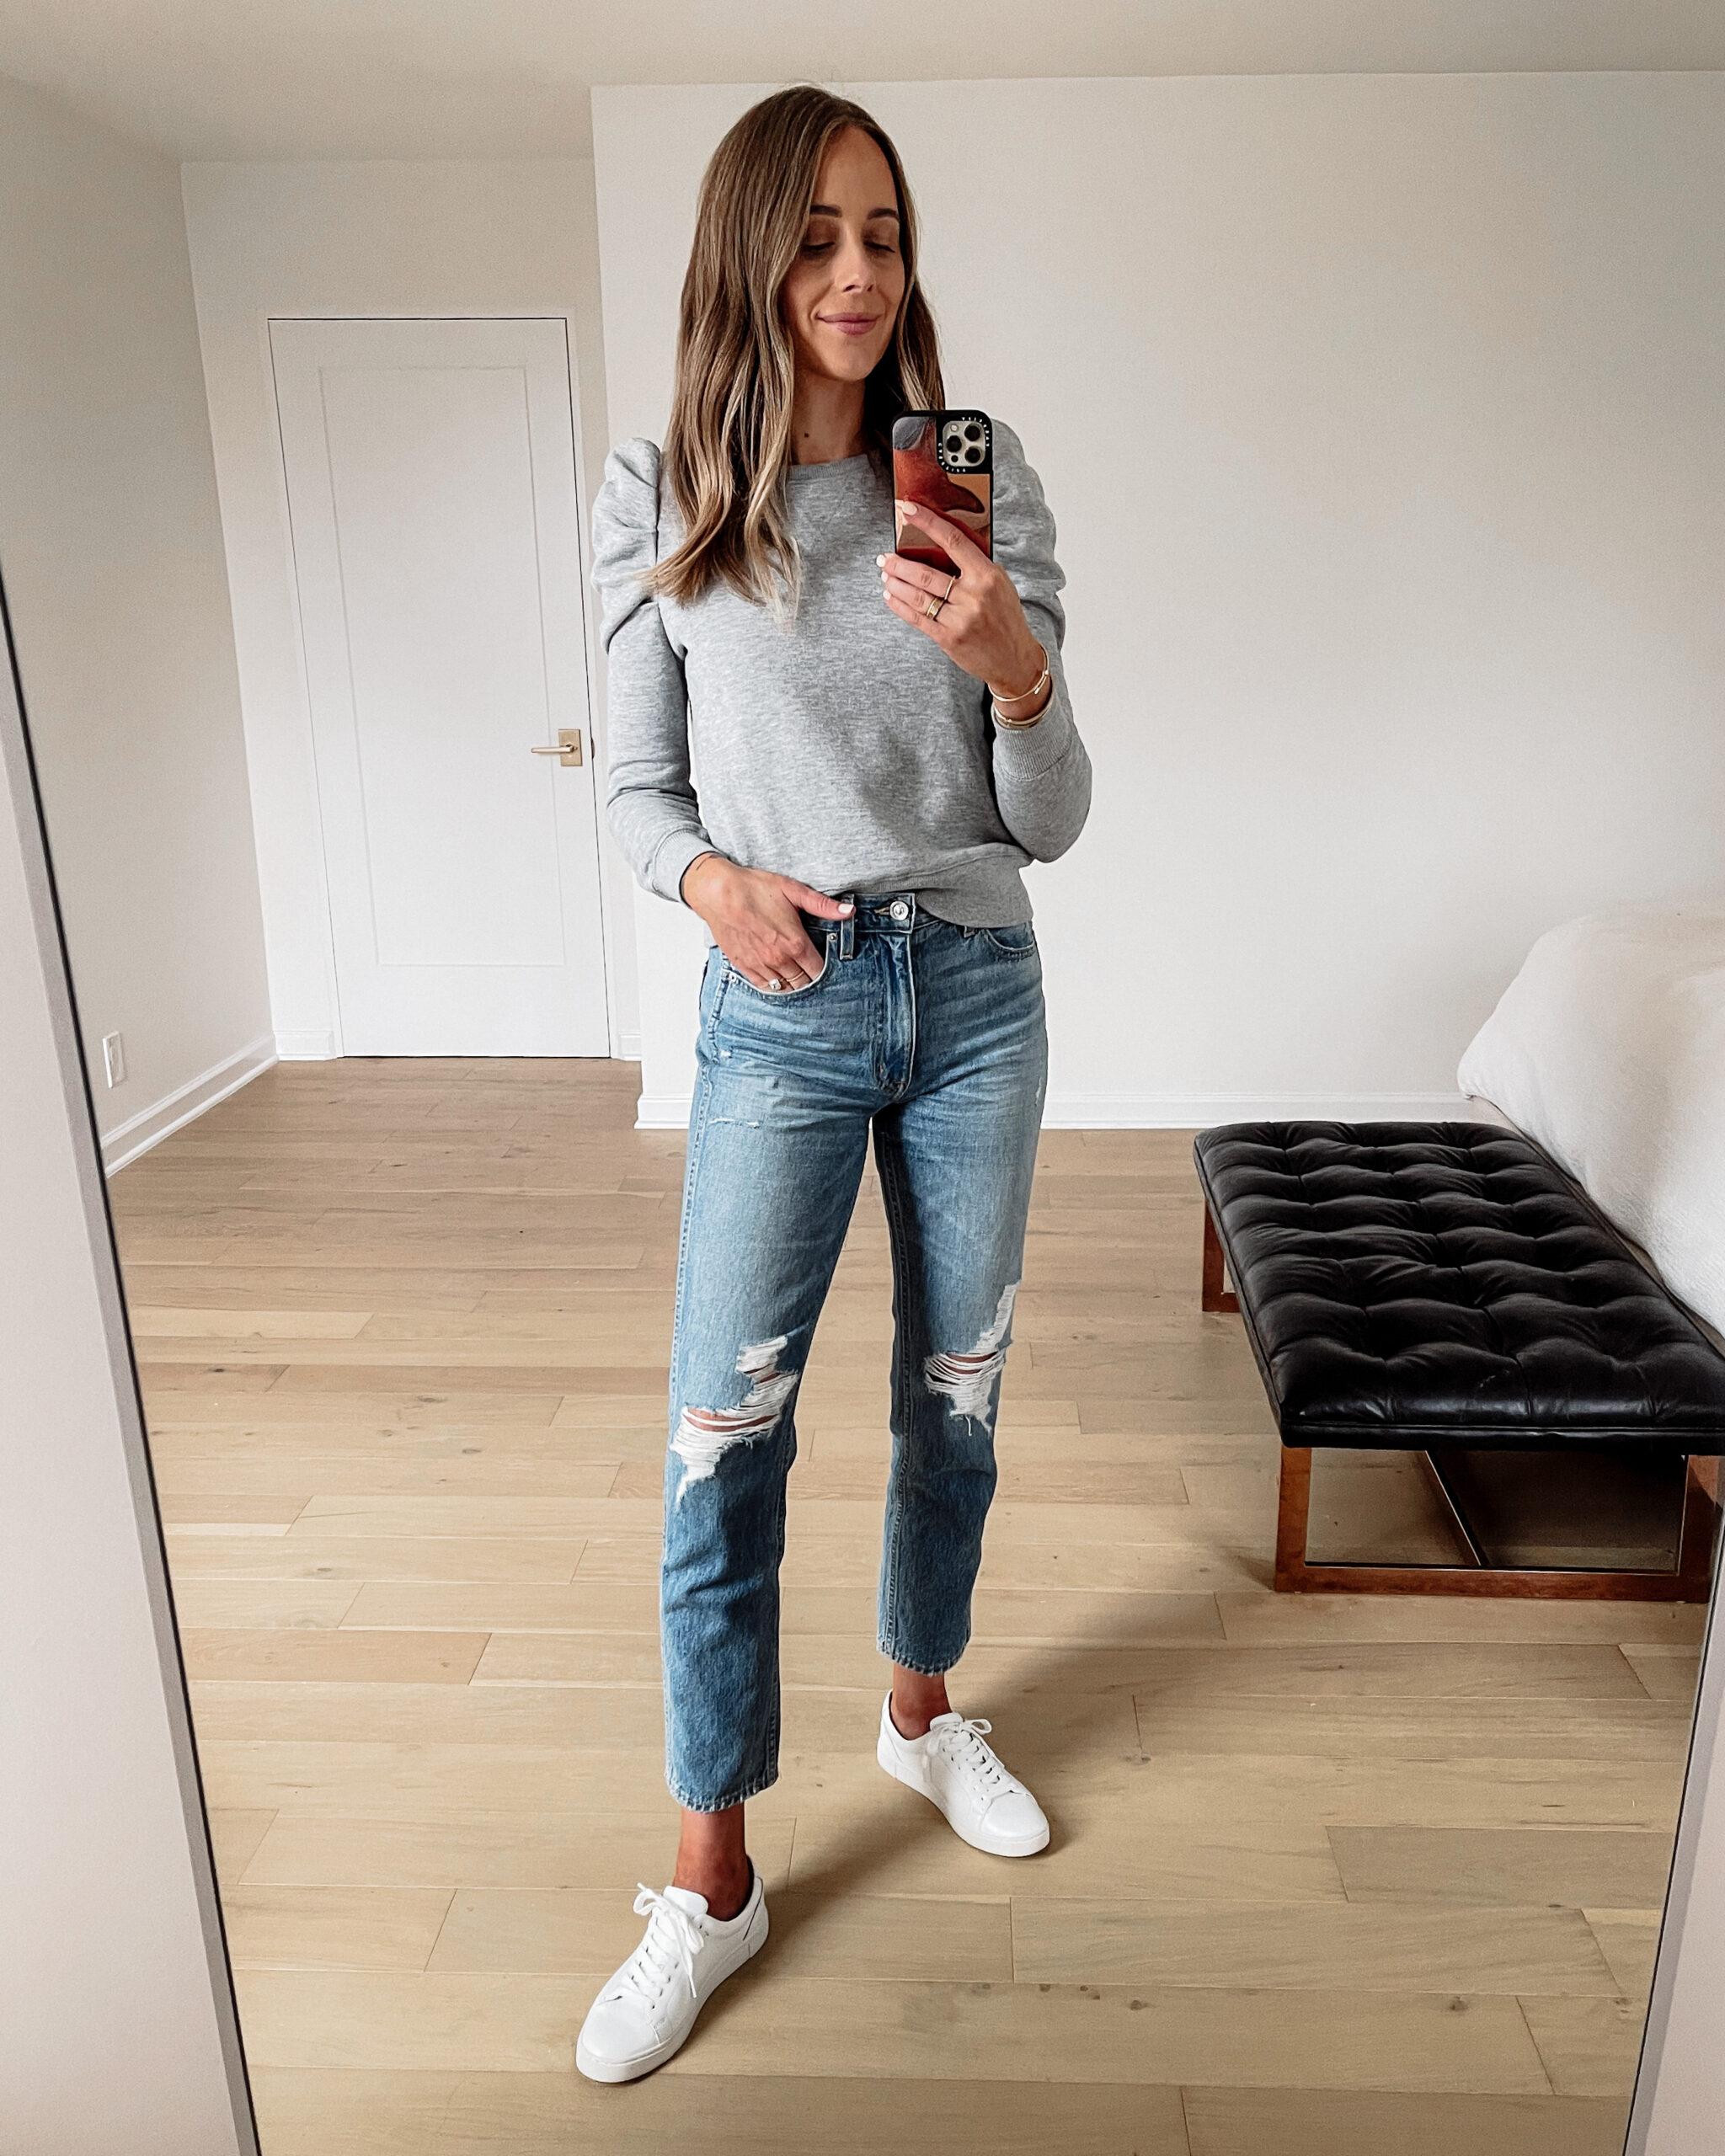 Fashion Jackson Wearing Grey Puff Sleeve Sweatshirt Ripped Jeans White Sneakers